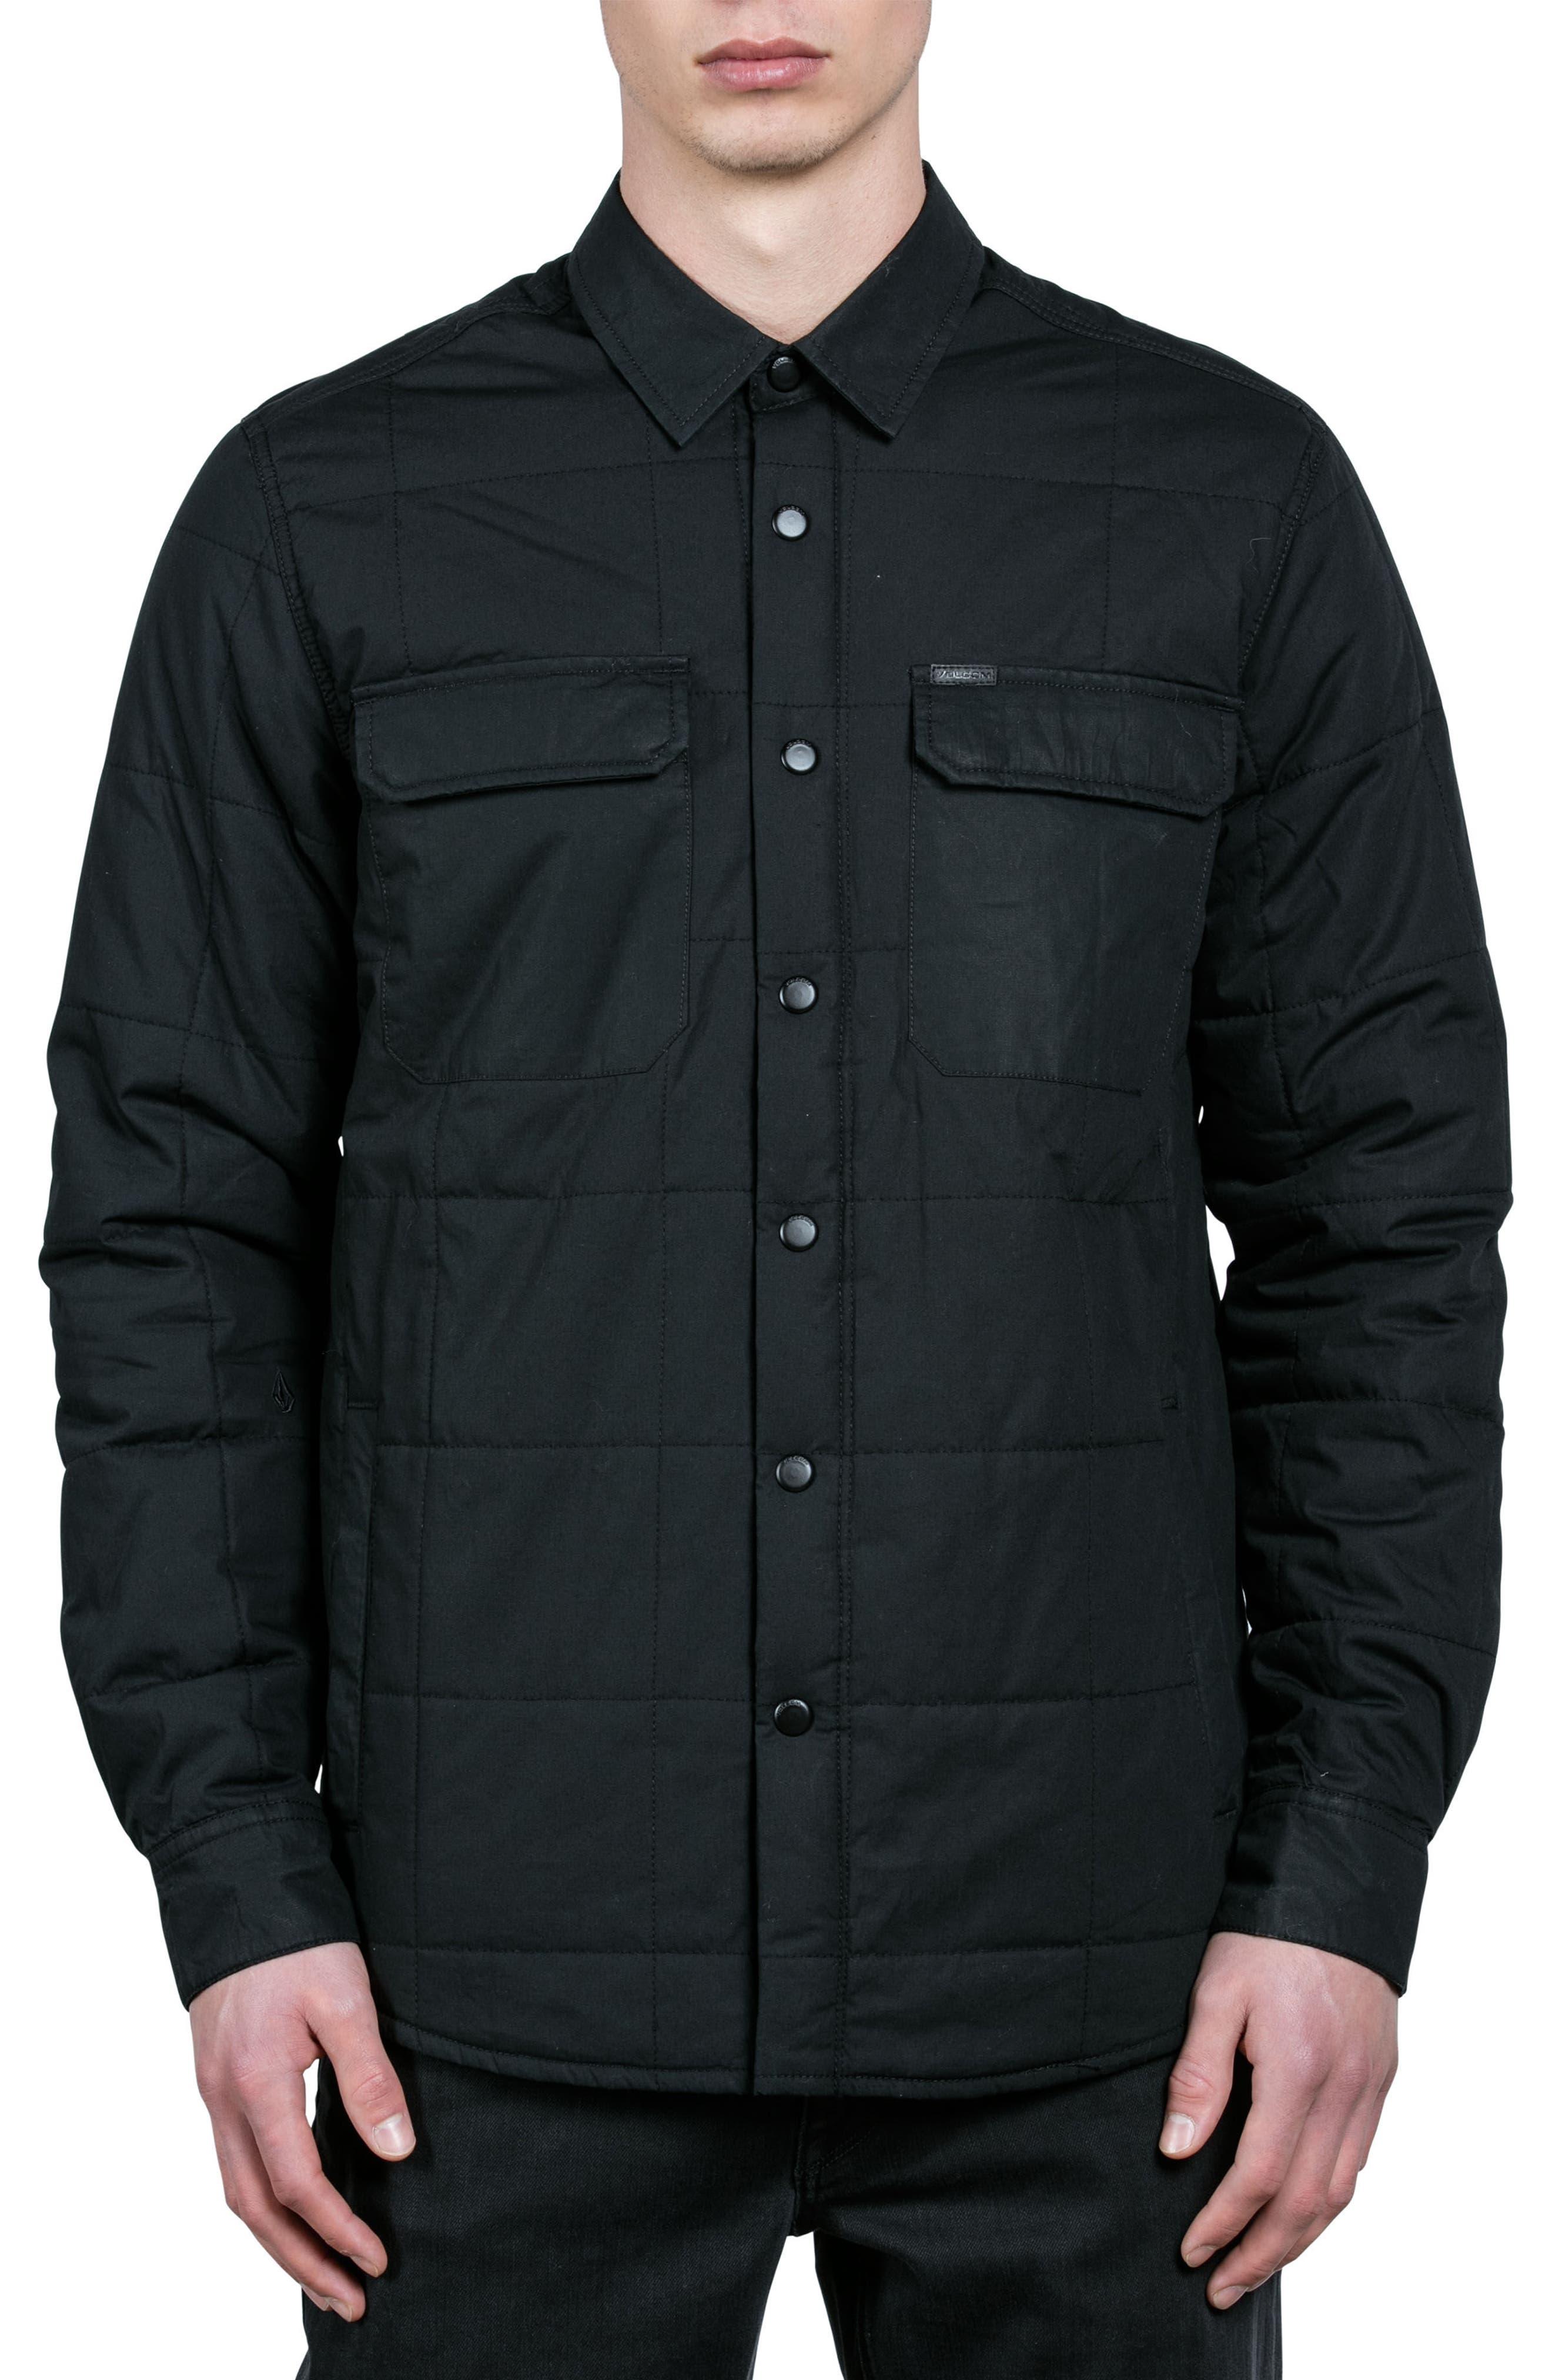 Larkin Quilted Shirt Jacket,                             Main thumbnail 1, color,                             001